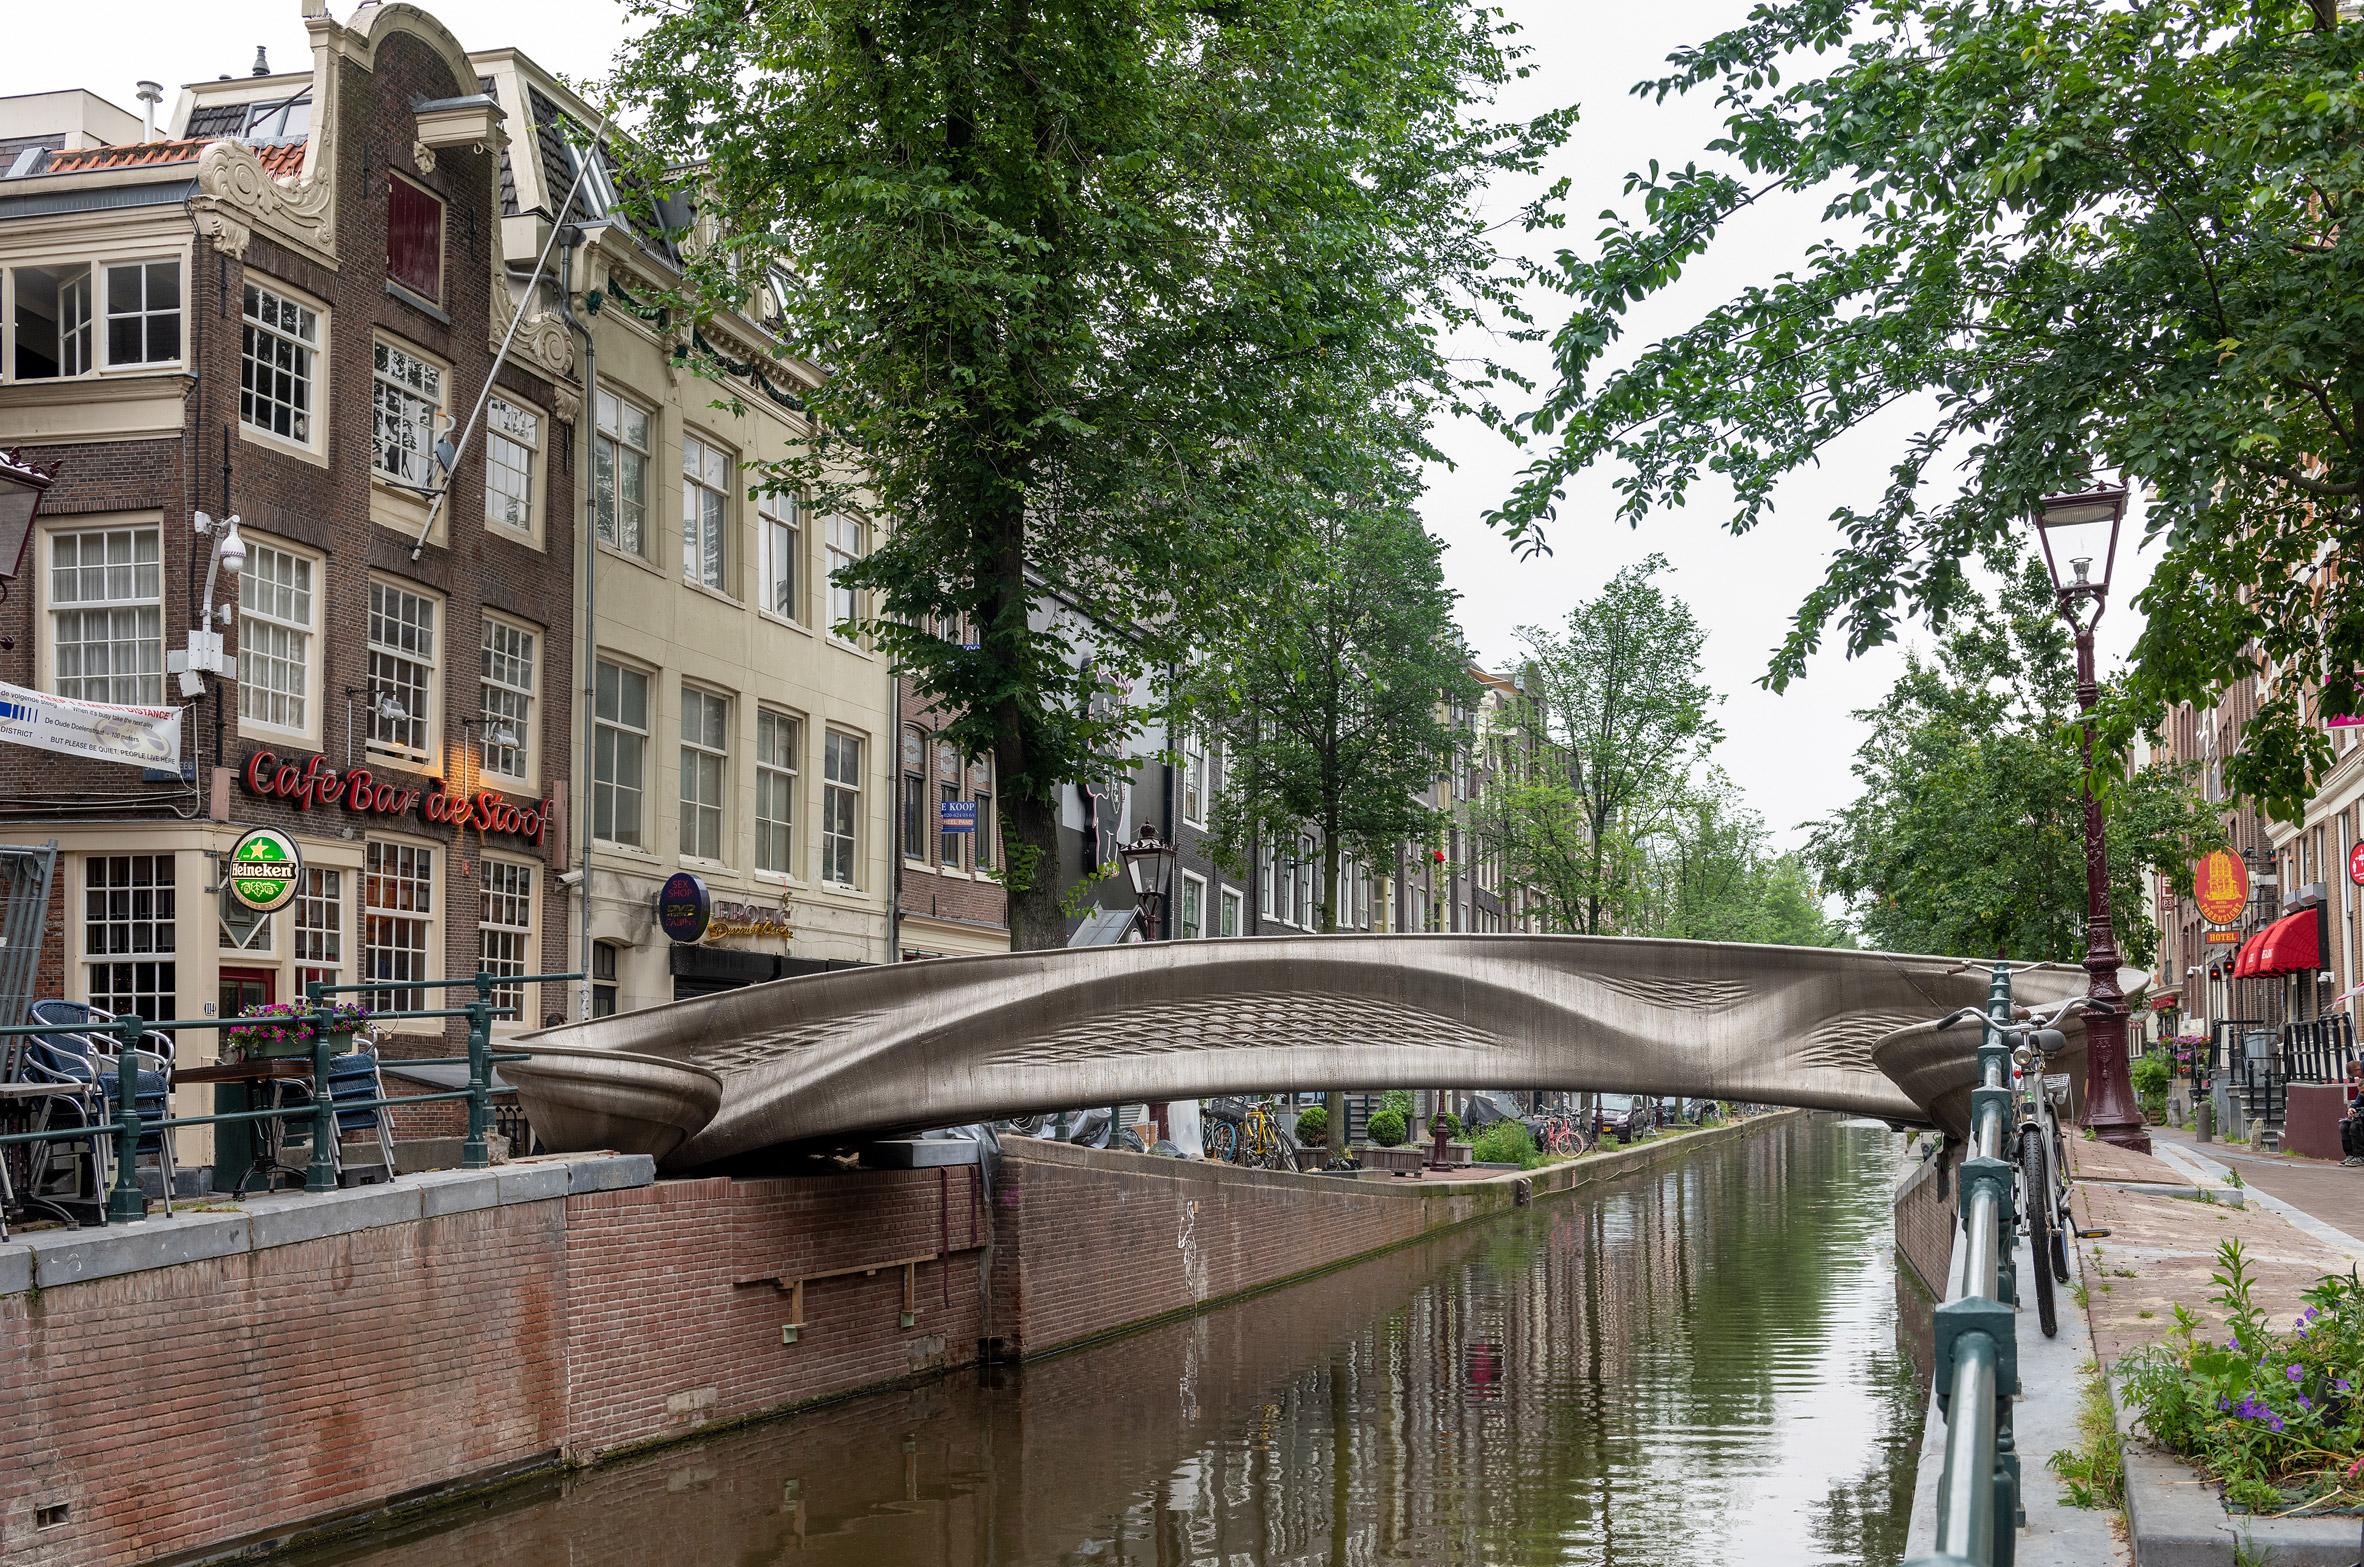 The bridge was designed using parametric modelling software